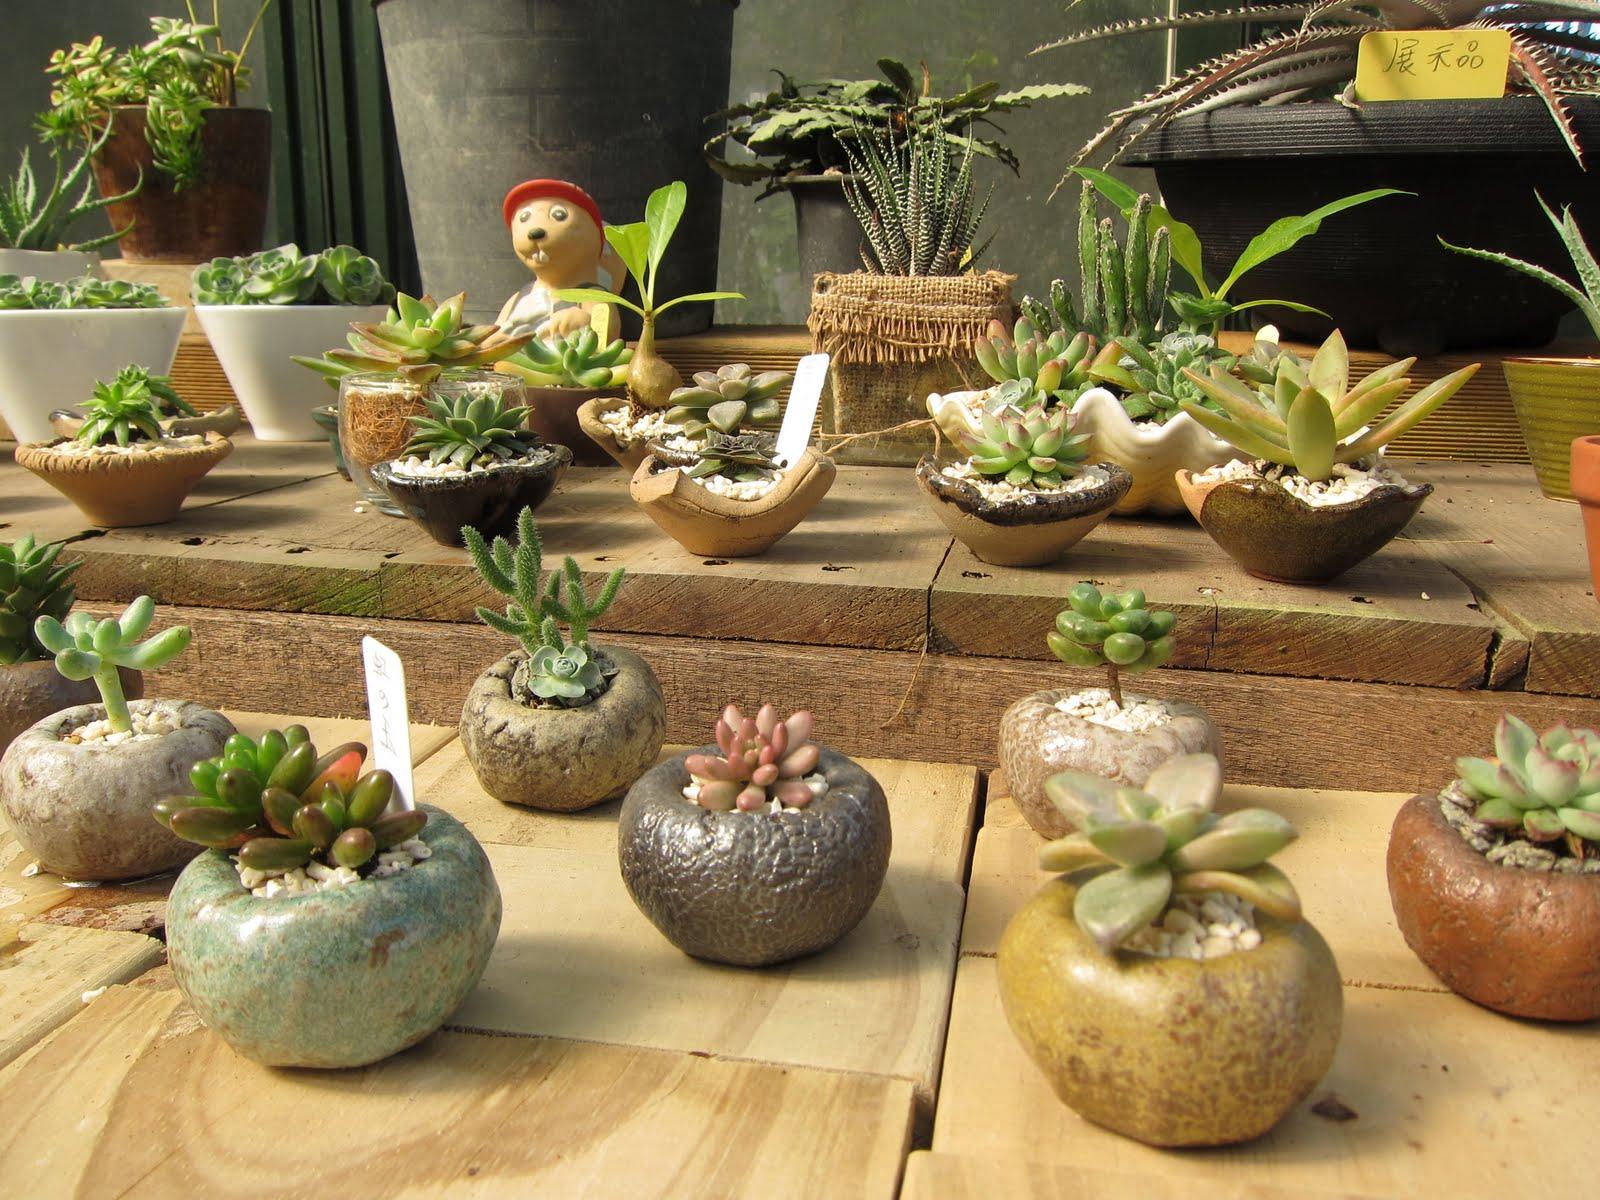 Succulents-lover 阿多肉: 再逛田尾(2):鴻霖園藝